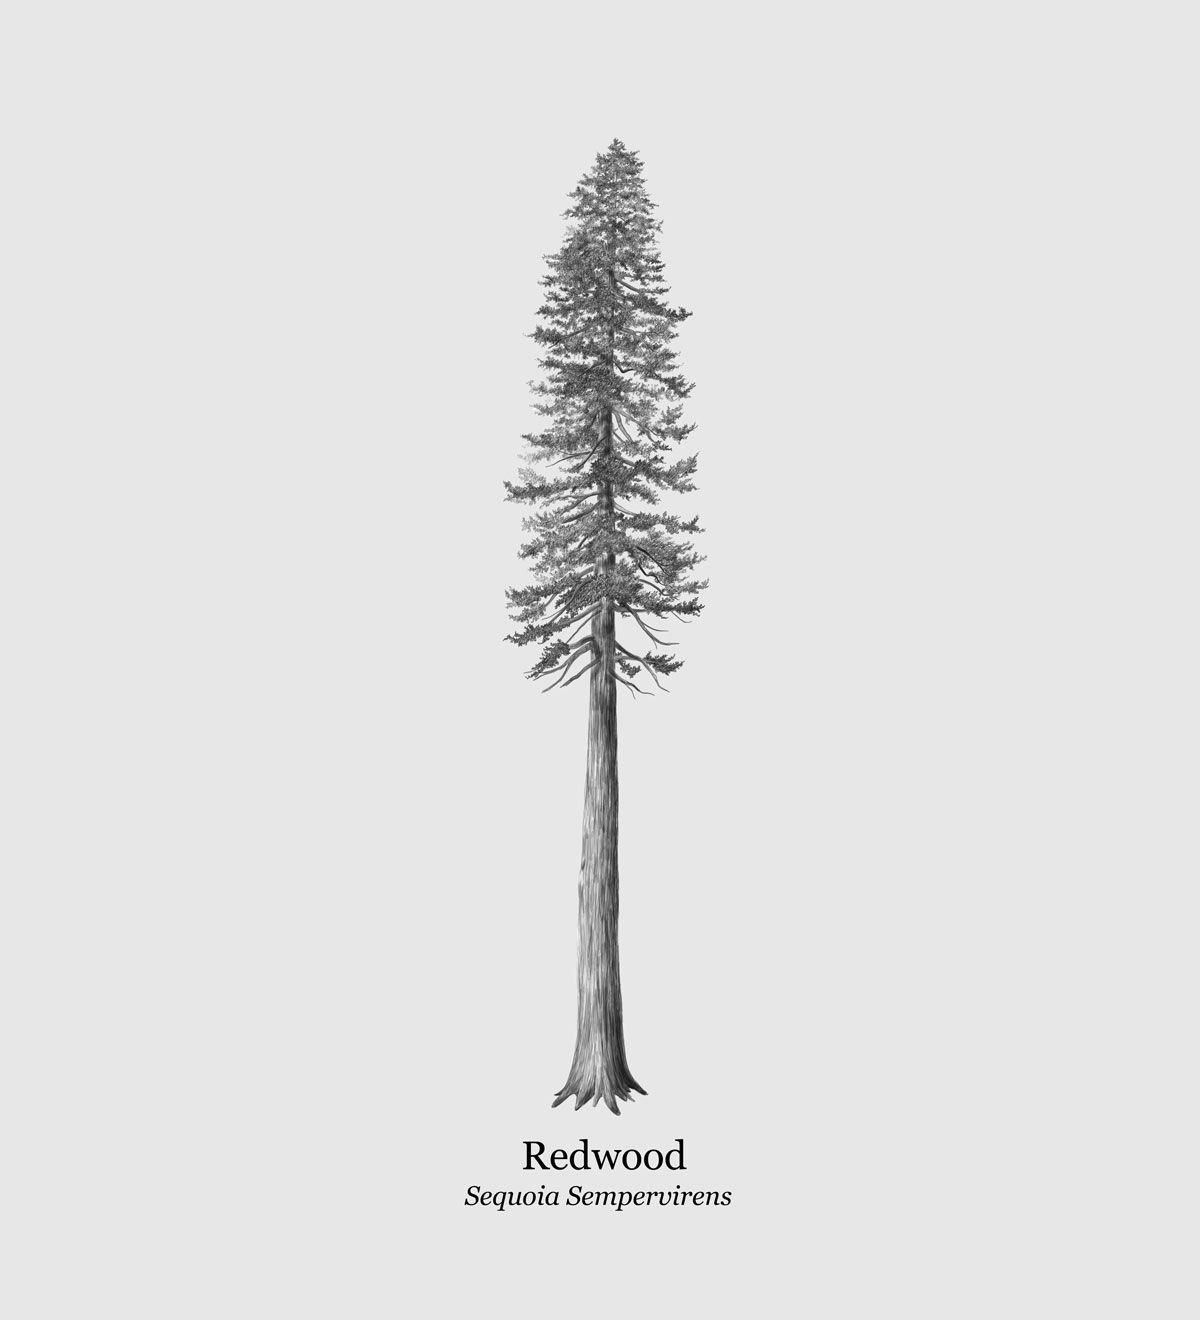 Redwood Digital Drawing#digital #drawing #redwood